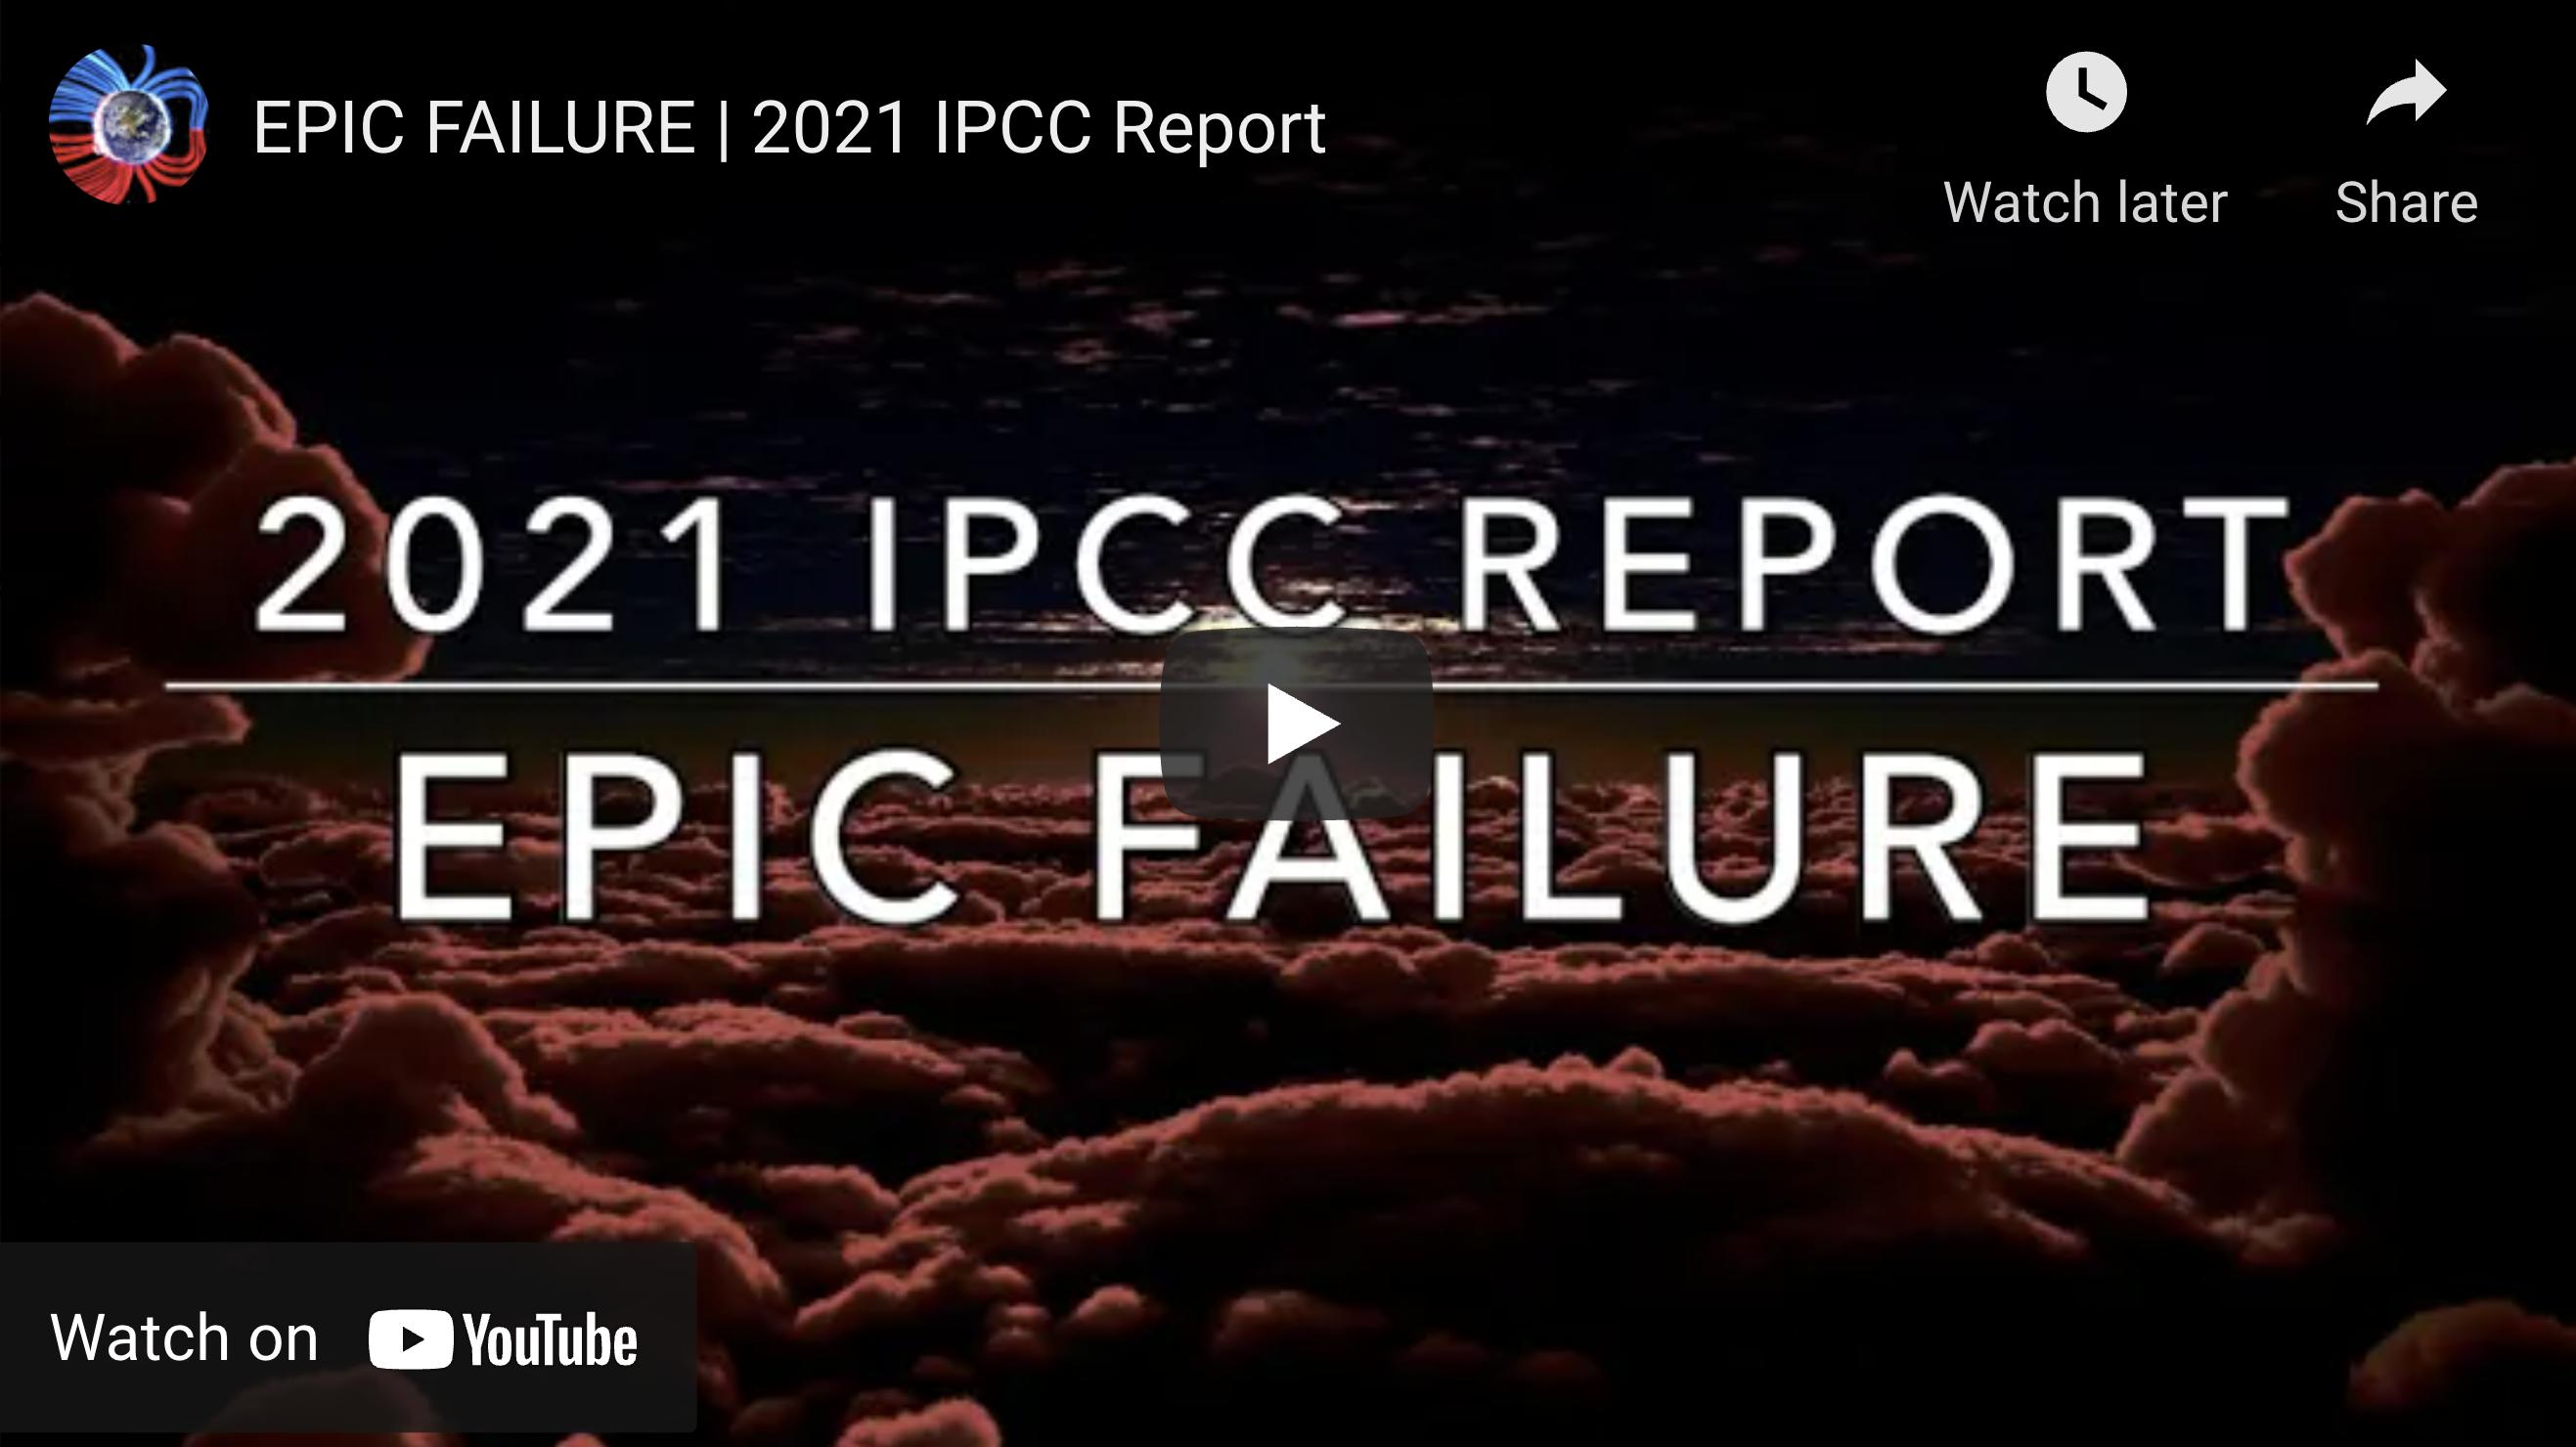 Suspicious Observers Post EPIC FAILURE 2021 IPCC Report EXZM Zack Mount August 10th 2021